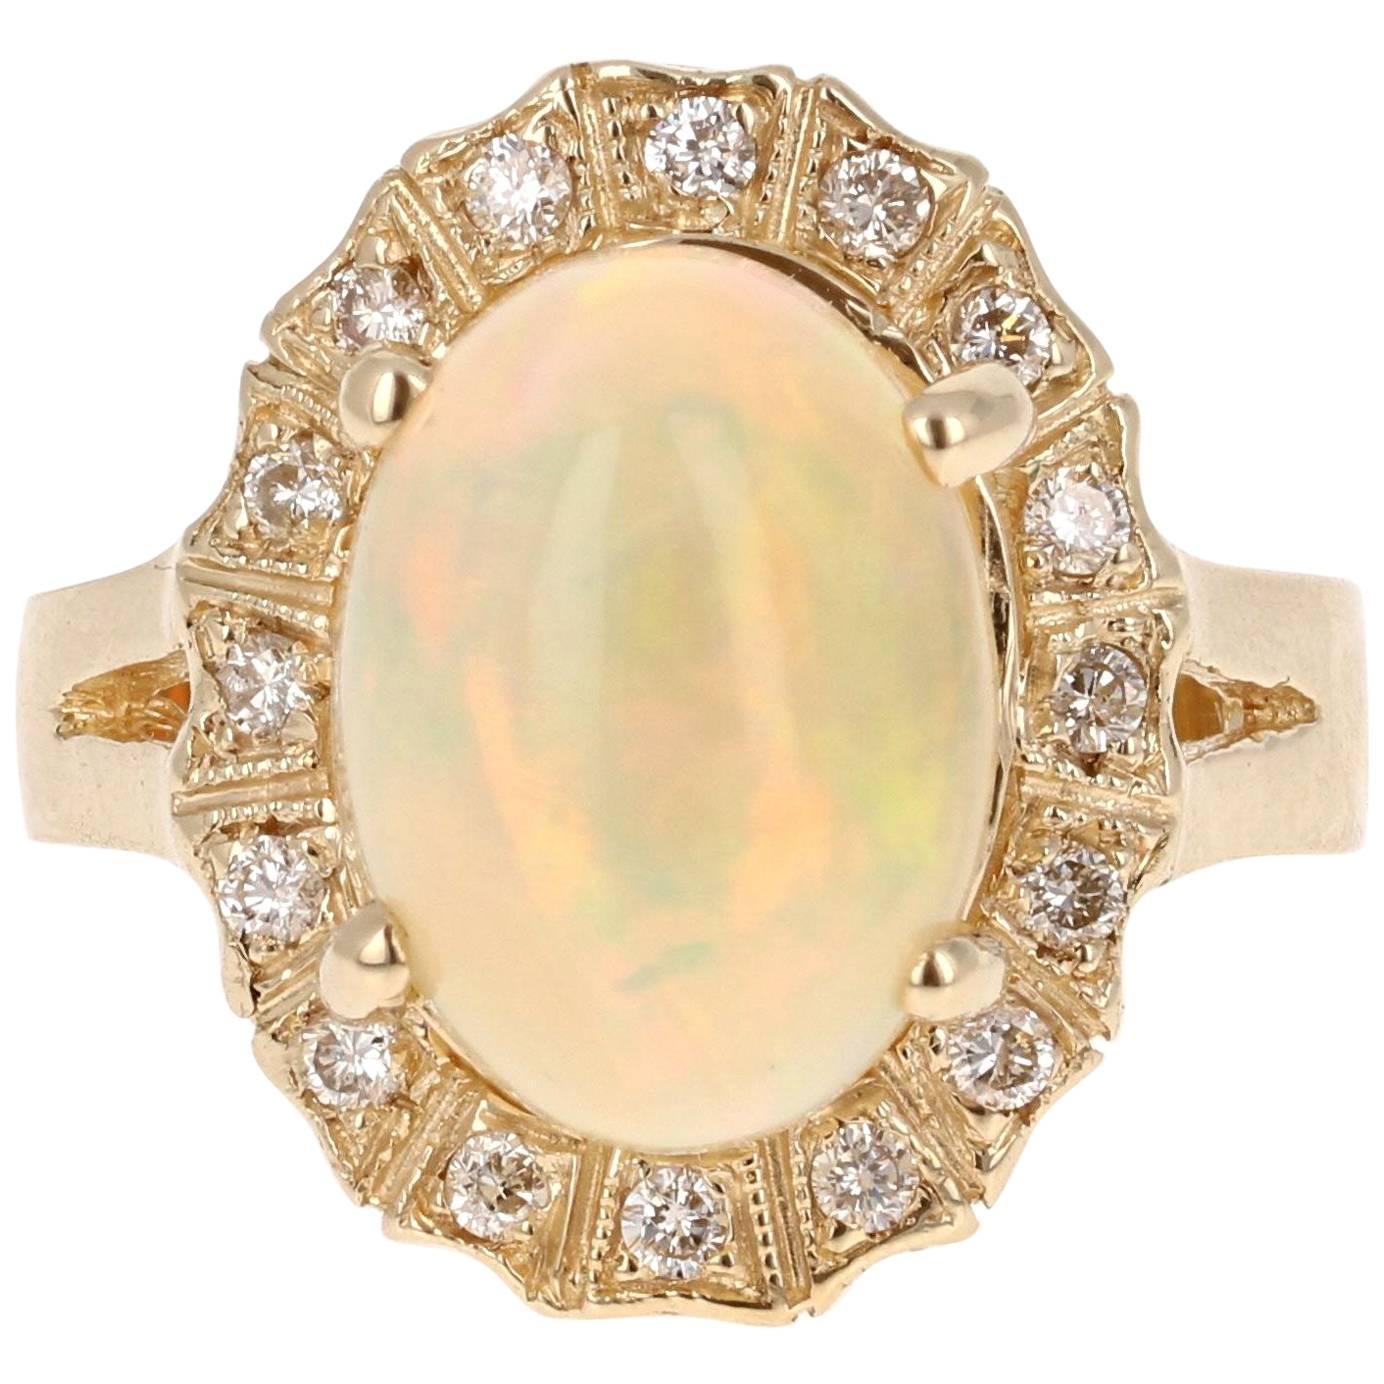 3.63 Carat Opal Diamond 14K Yellow Gold Statement Ring